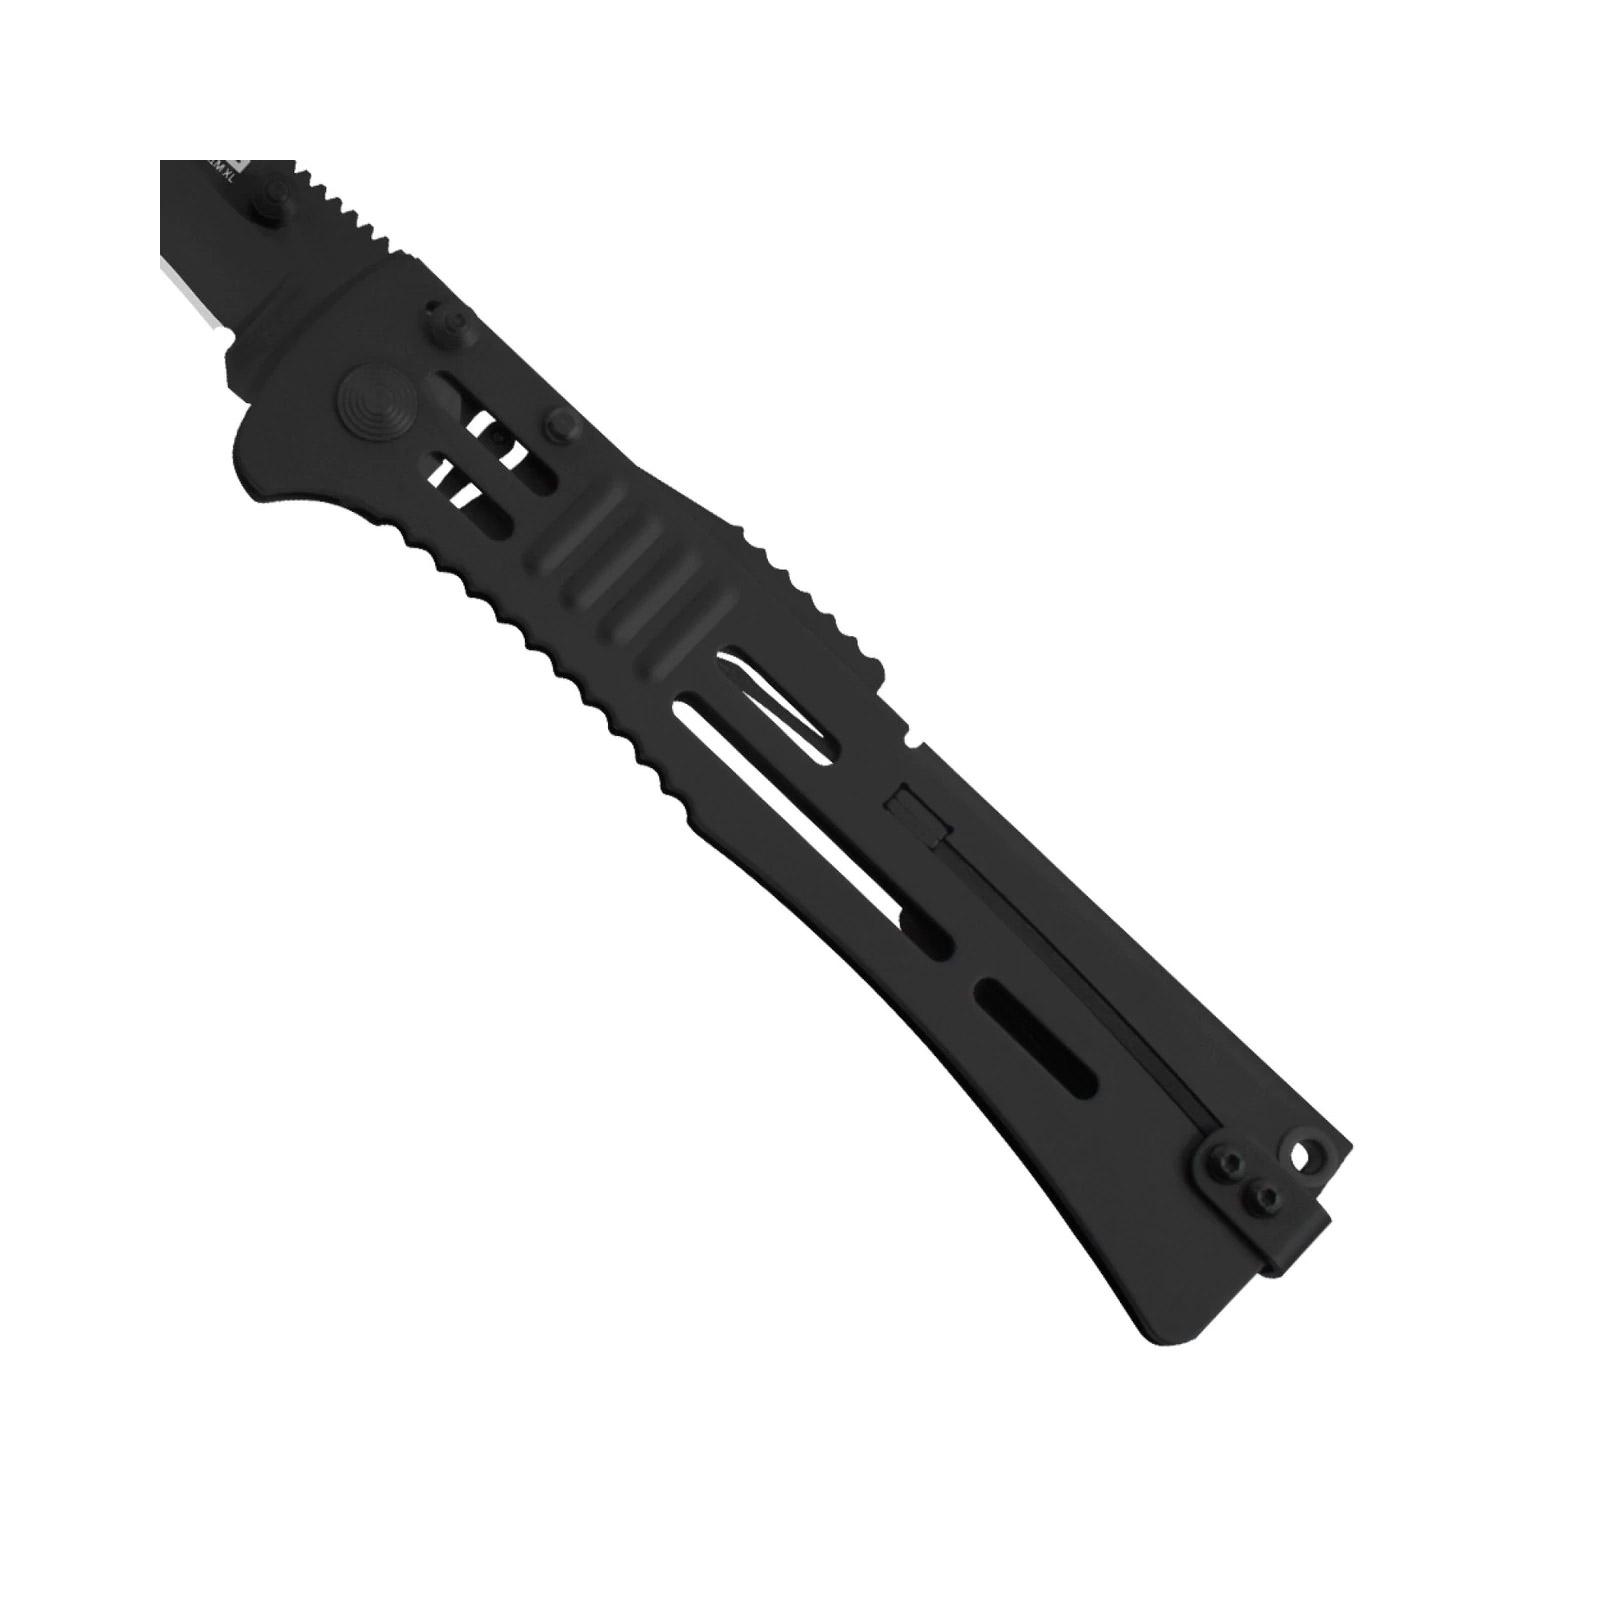 Нож SOG SlimJim XL (SJ51-CP) изображение 4